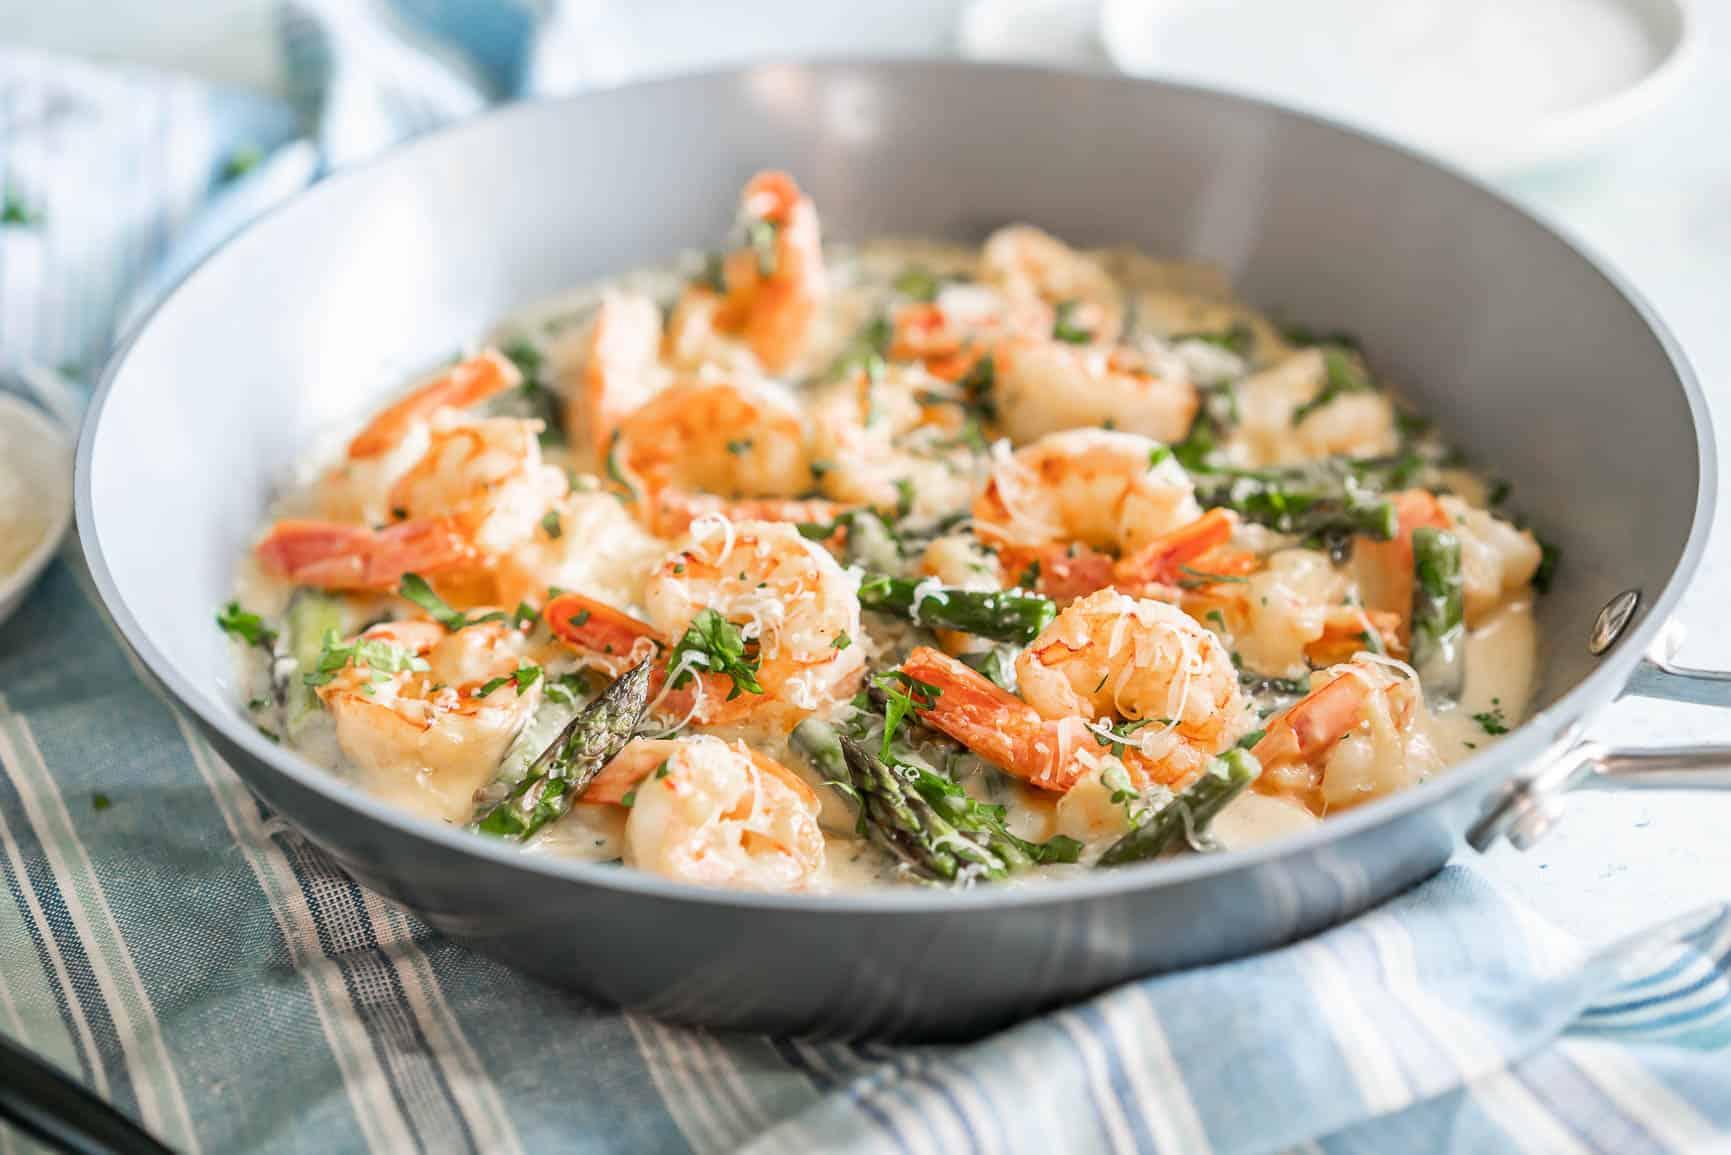 Keto Creamy Asparagus and Shrimp Alfredo {Gluten-Free & Primal}